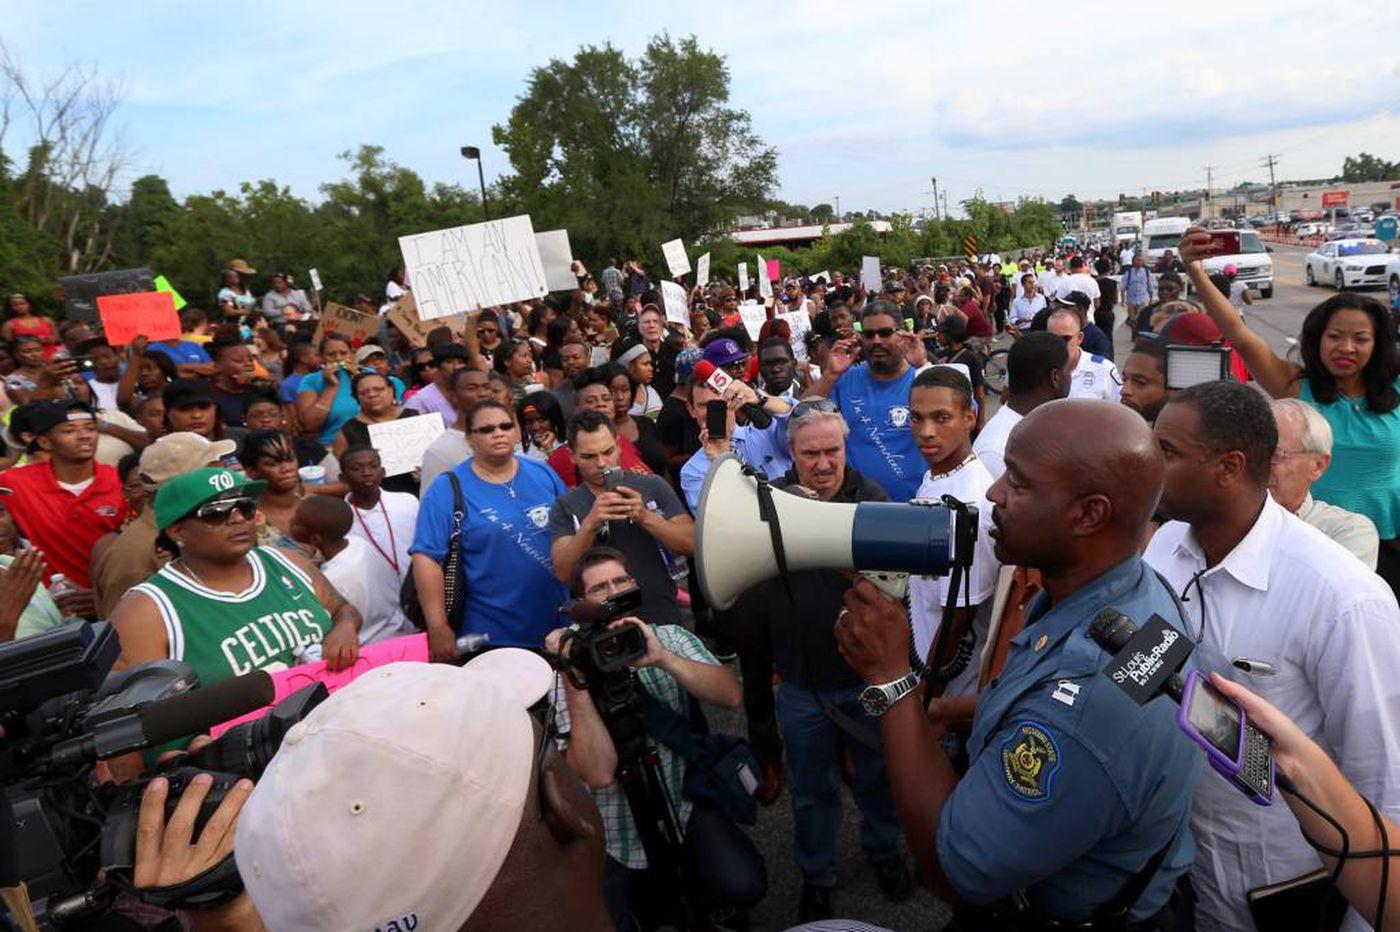 Military veterans see flawed police response in Ferguson